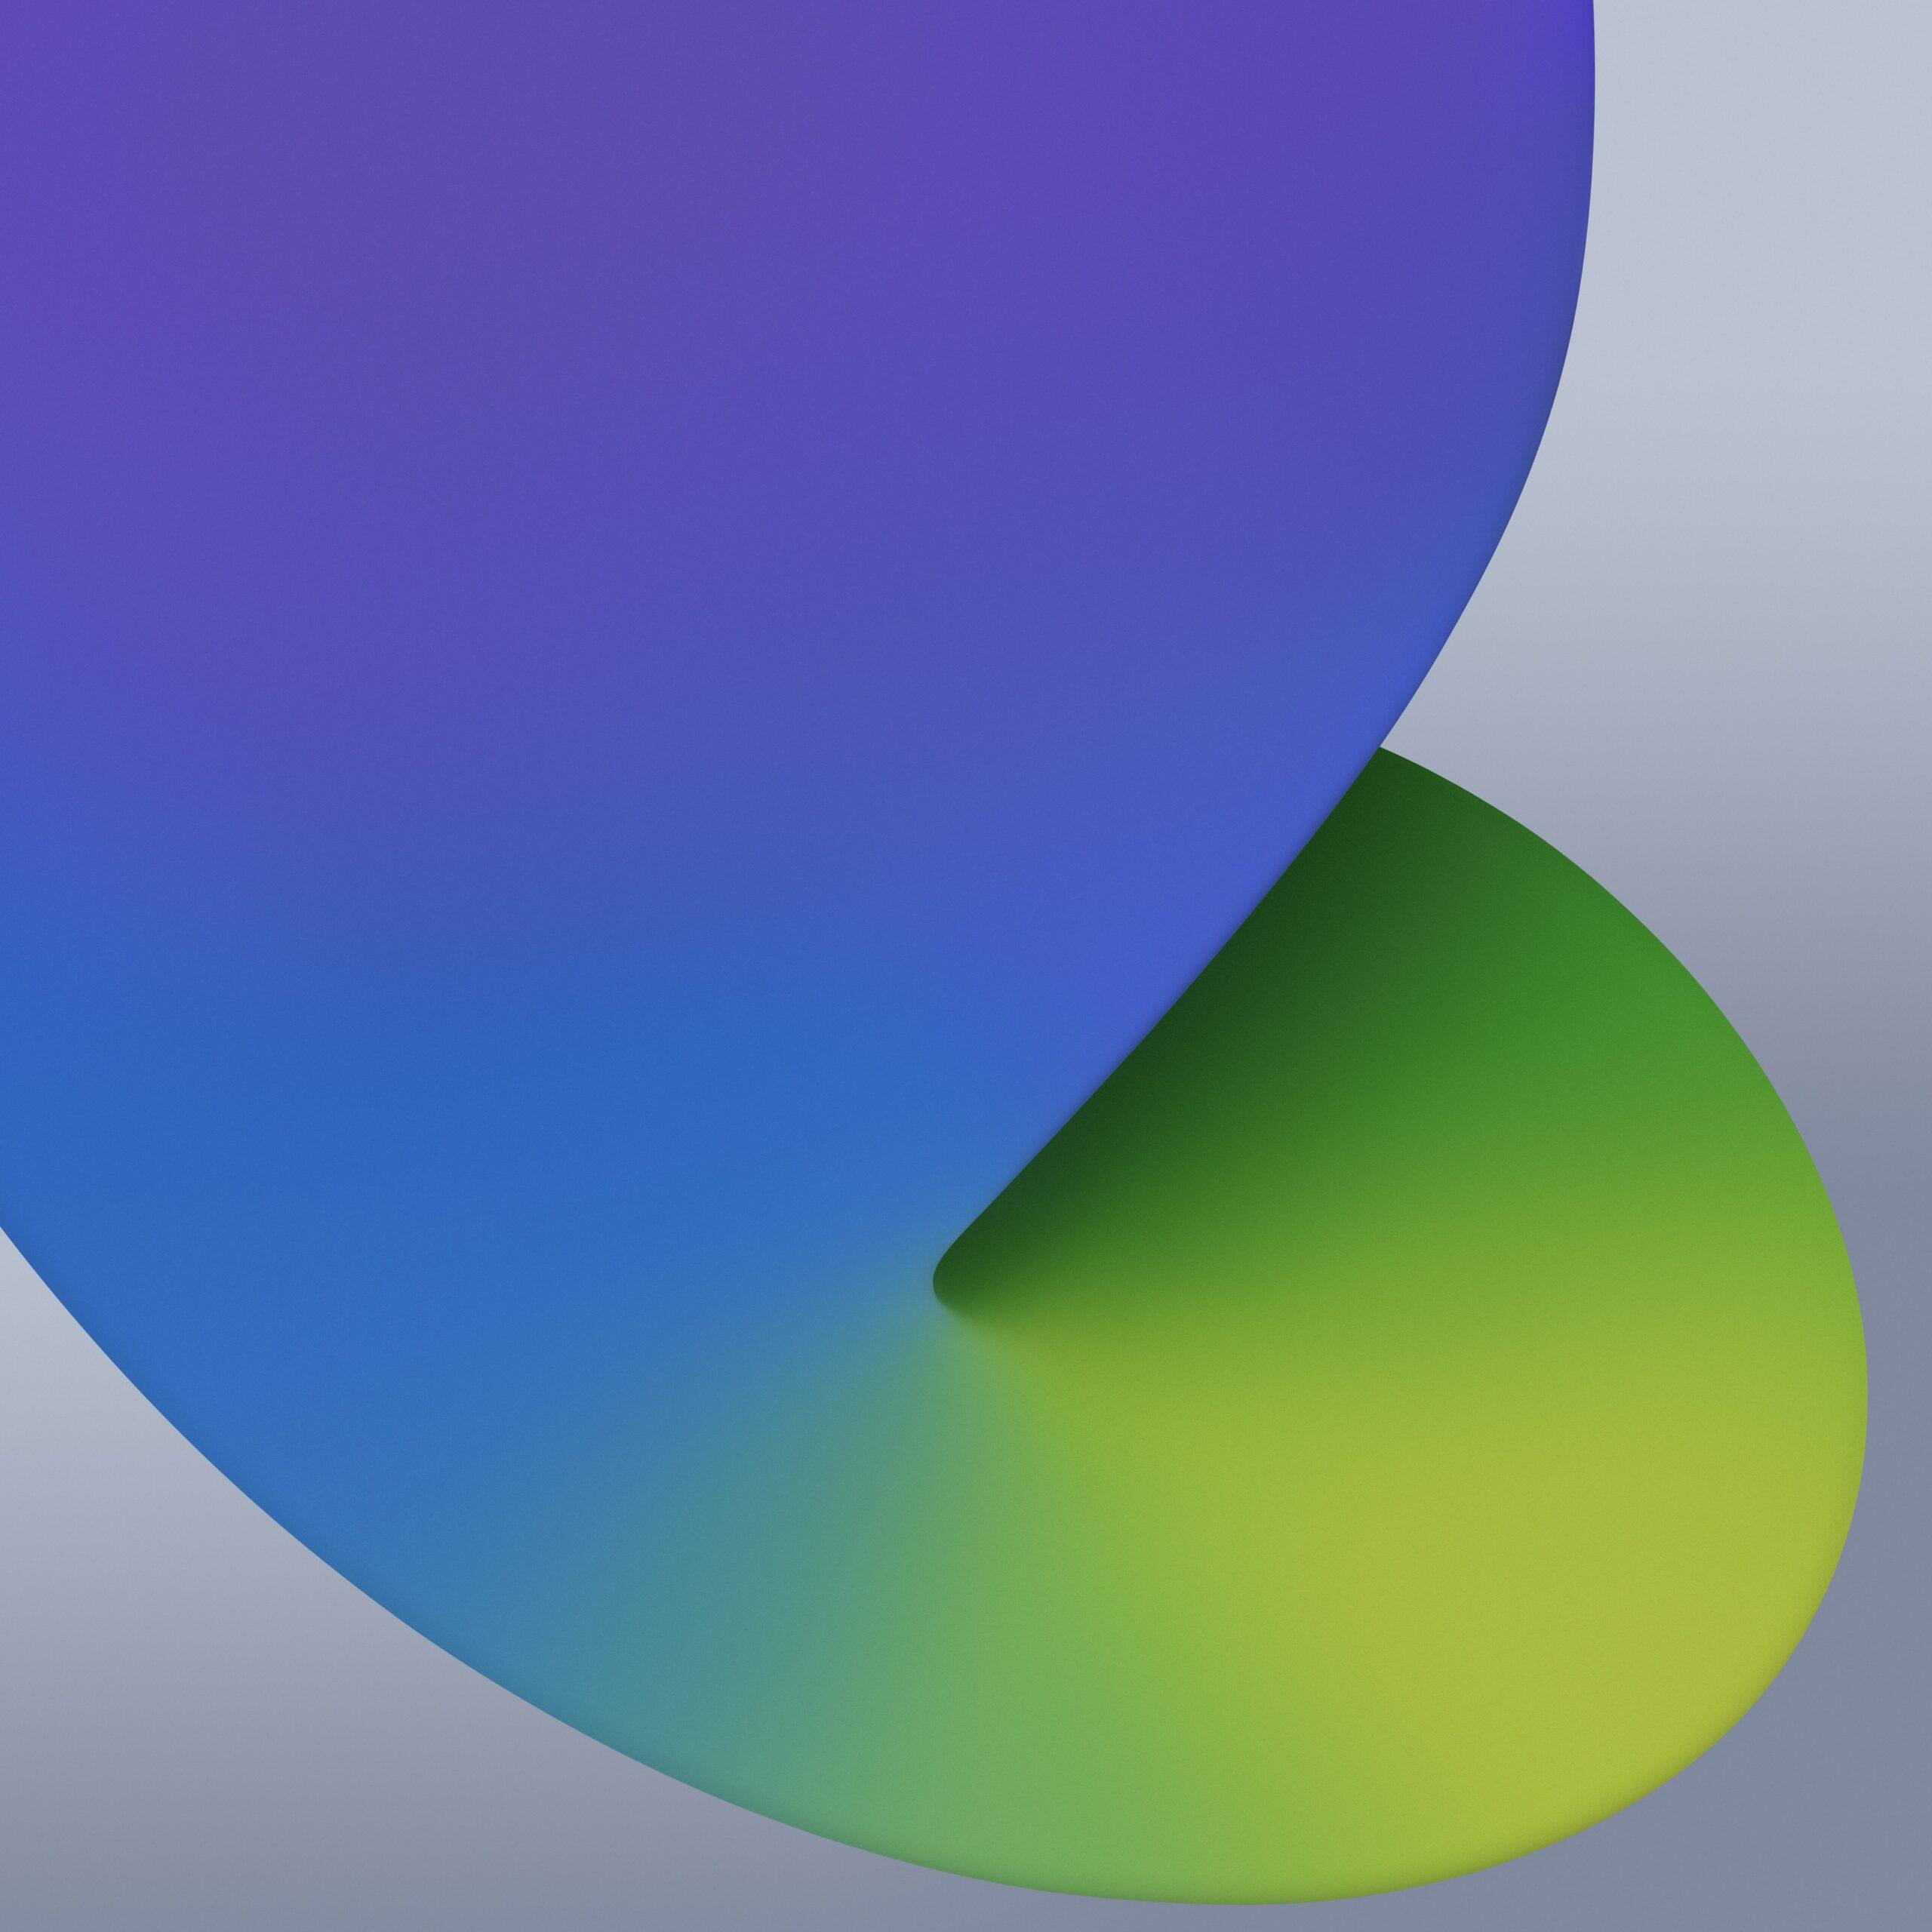 iPadOS 14 Wallpaper